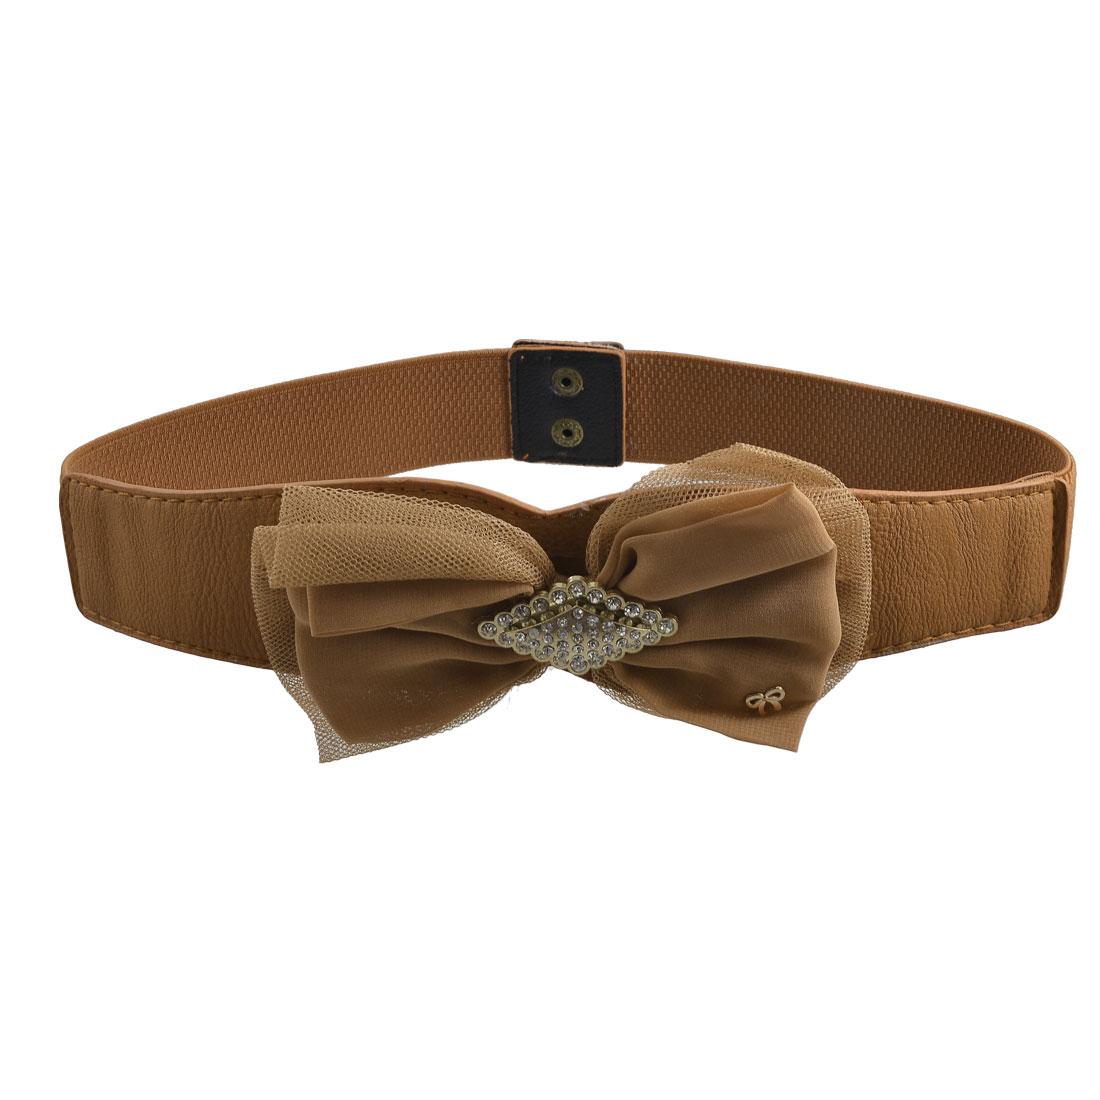 Rhinestone Bowknot Detailing Press Stud Button Brown Elastic Waist Belt